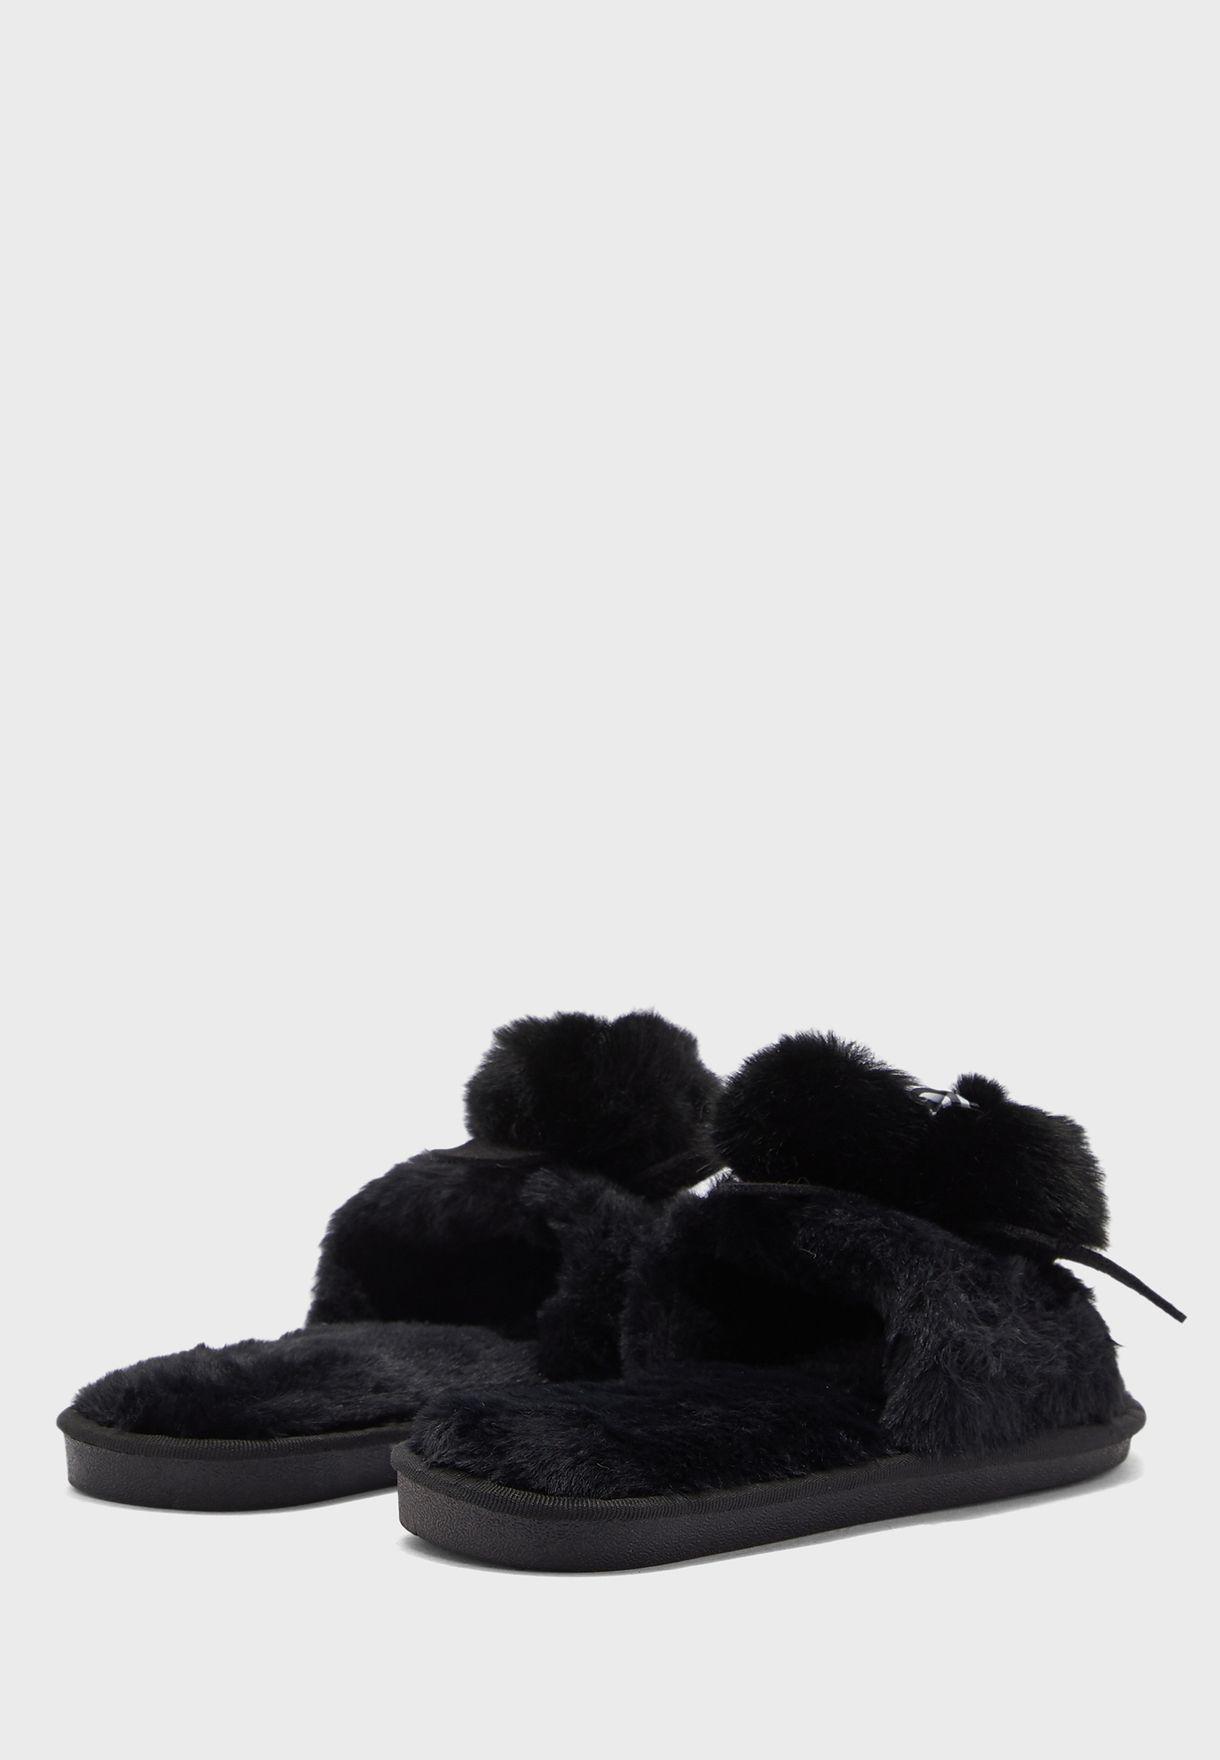 Pom Pom Bow Open Toe Bedroom Slippers